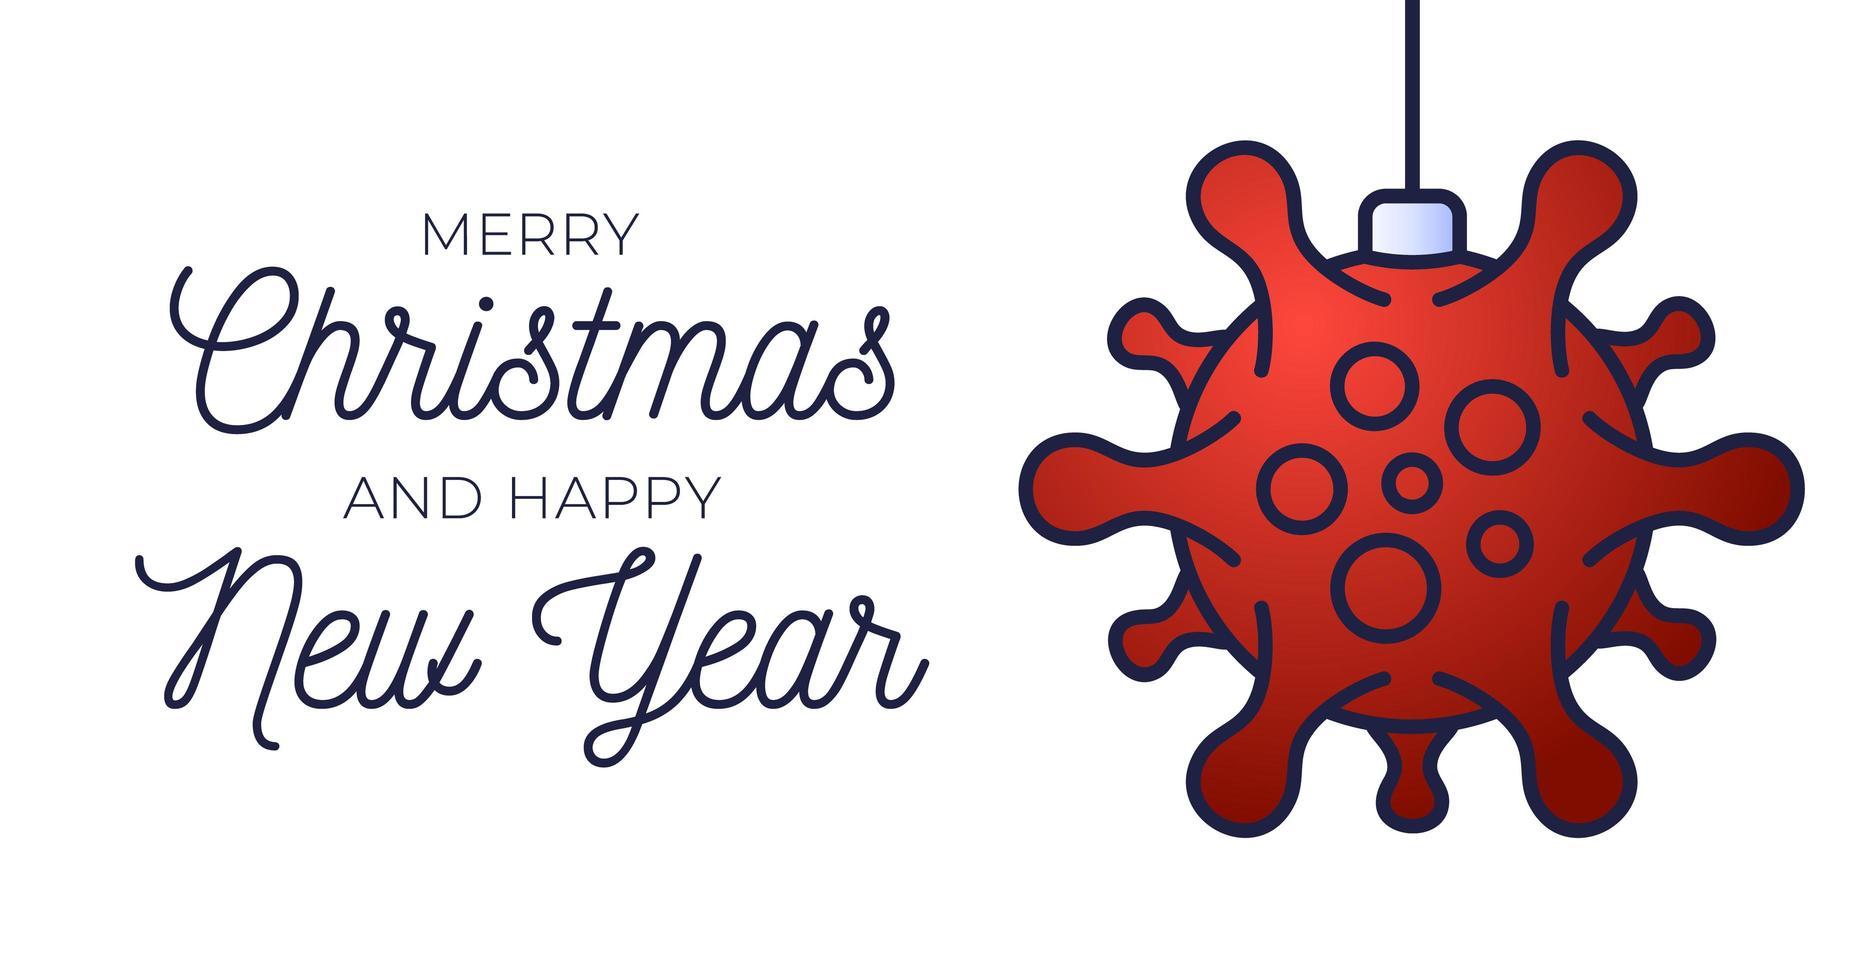 röd coronavirus jul boll affisch vektor